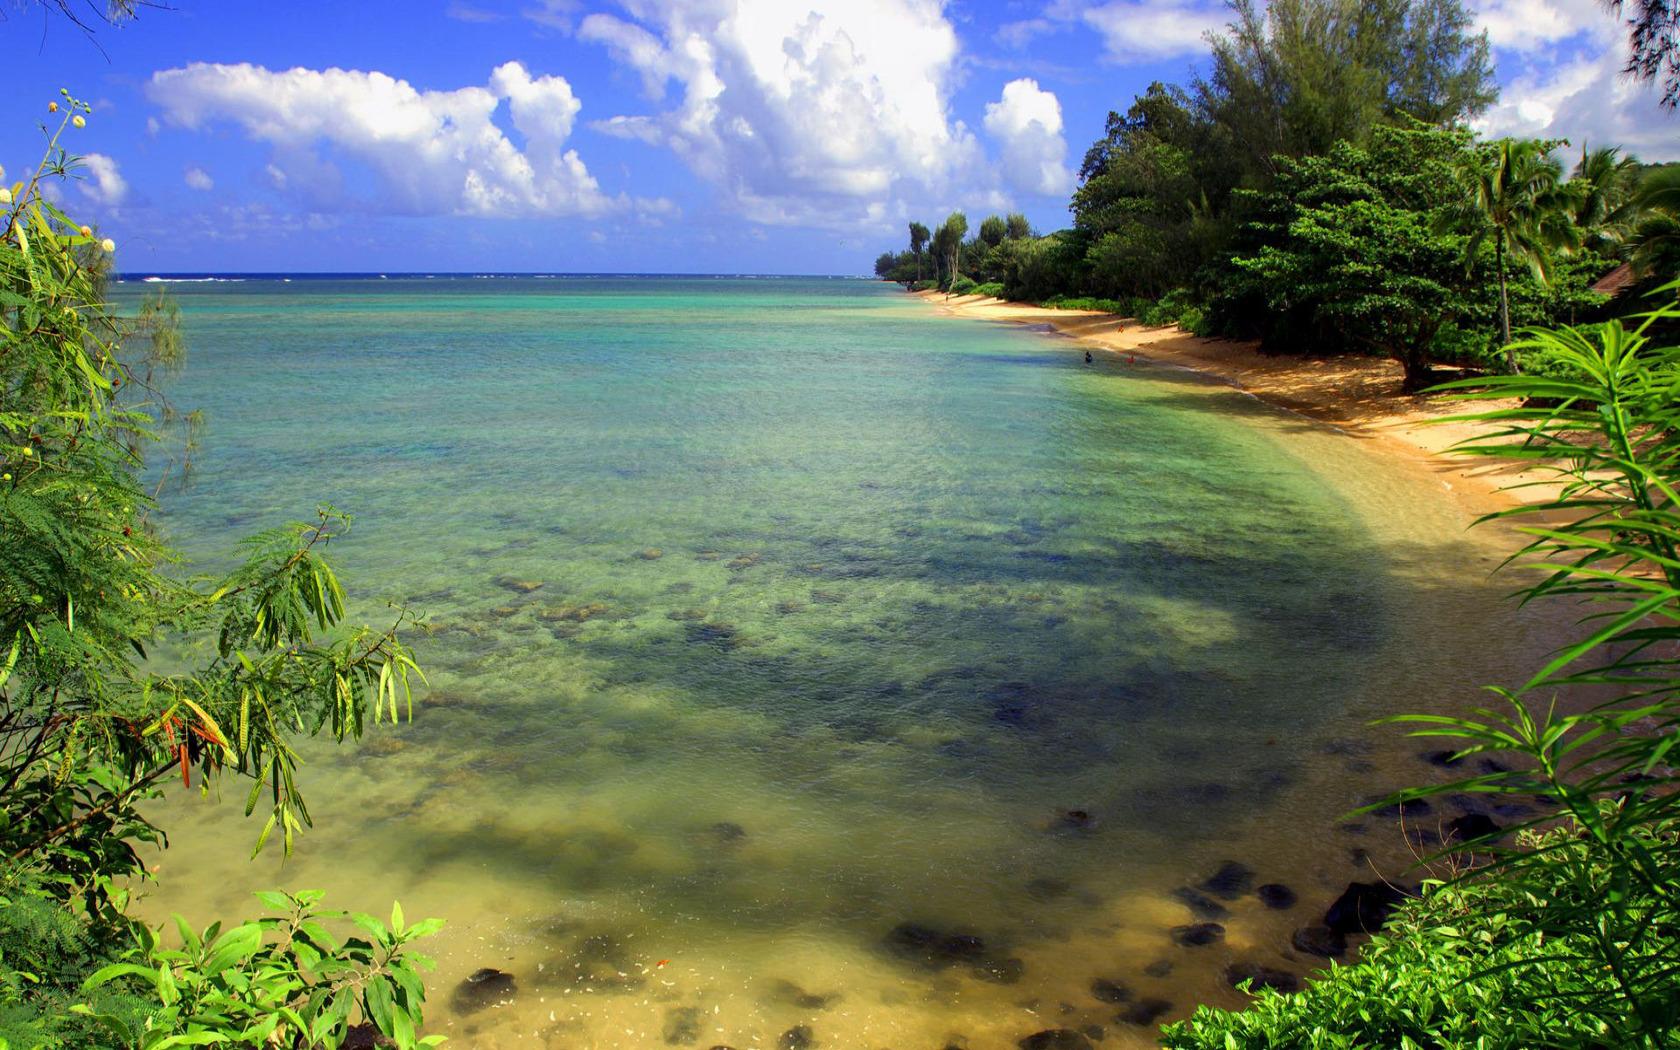 Download Tropical island beach wallpaper 1680x1050